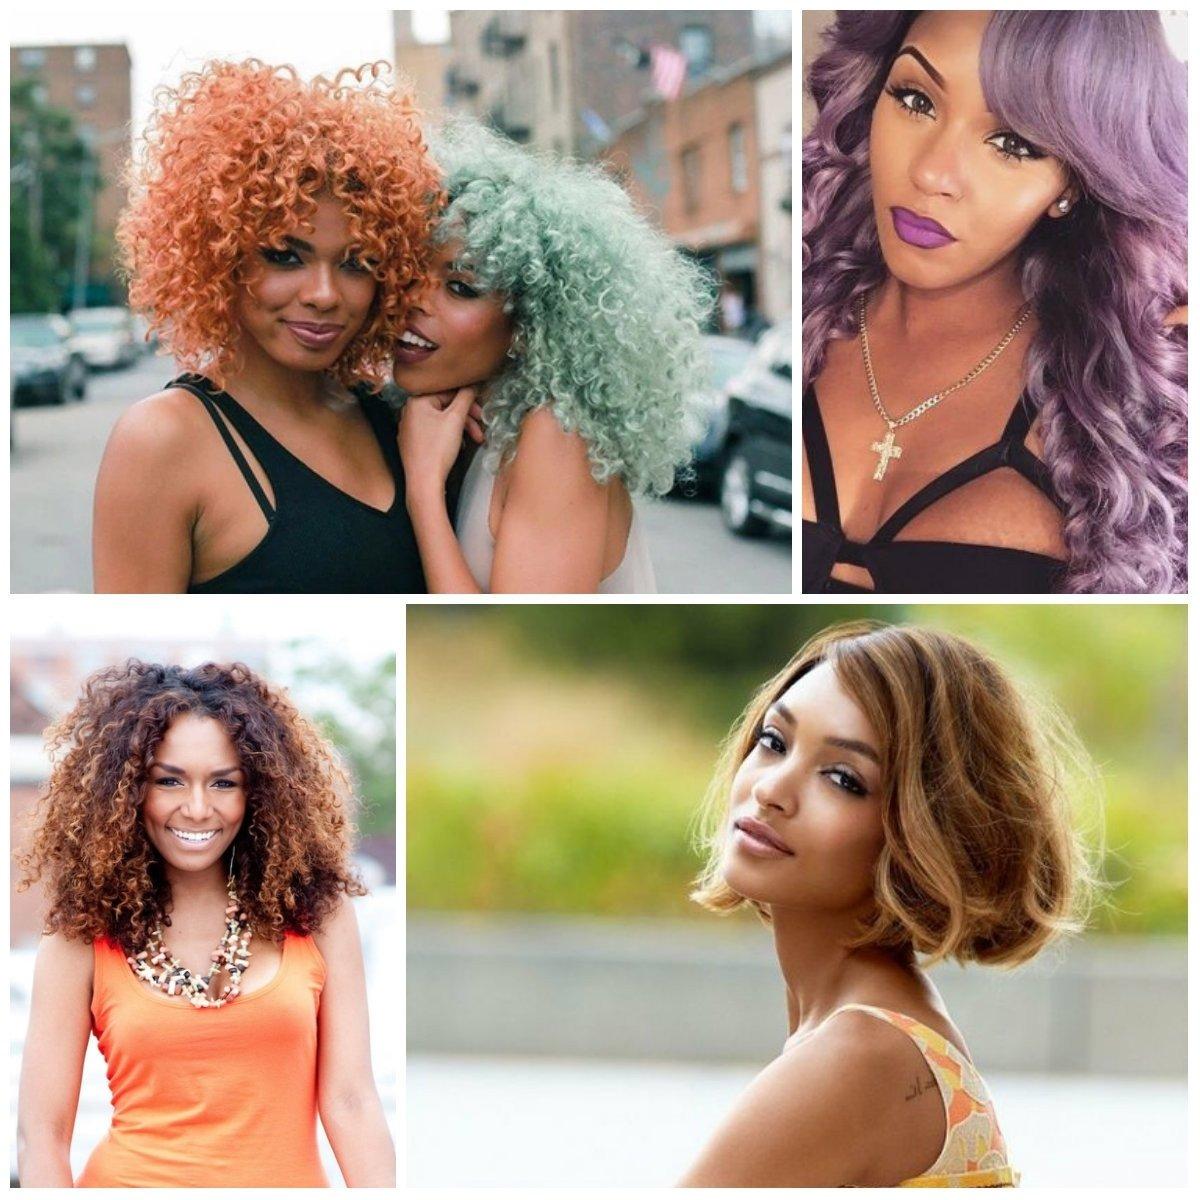 10 Stunning Hair Color Ideas For Dark Skin 2017 hair colors for women with dark skin new hair color ideas 1